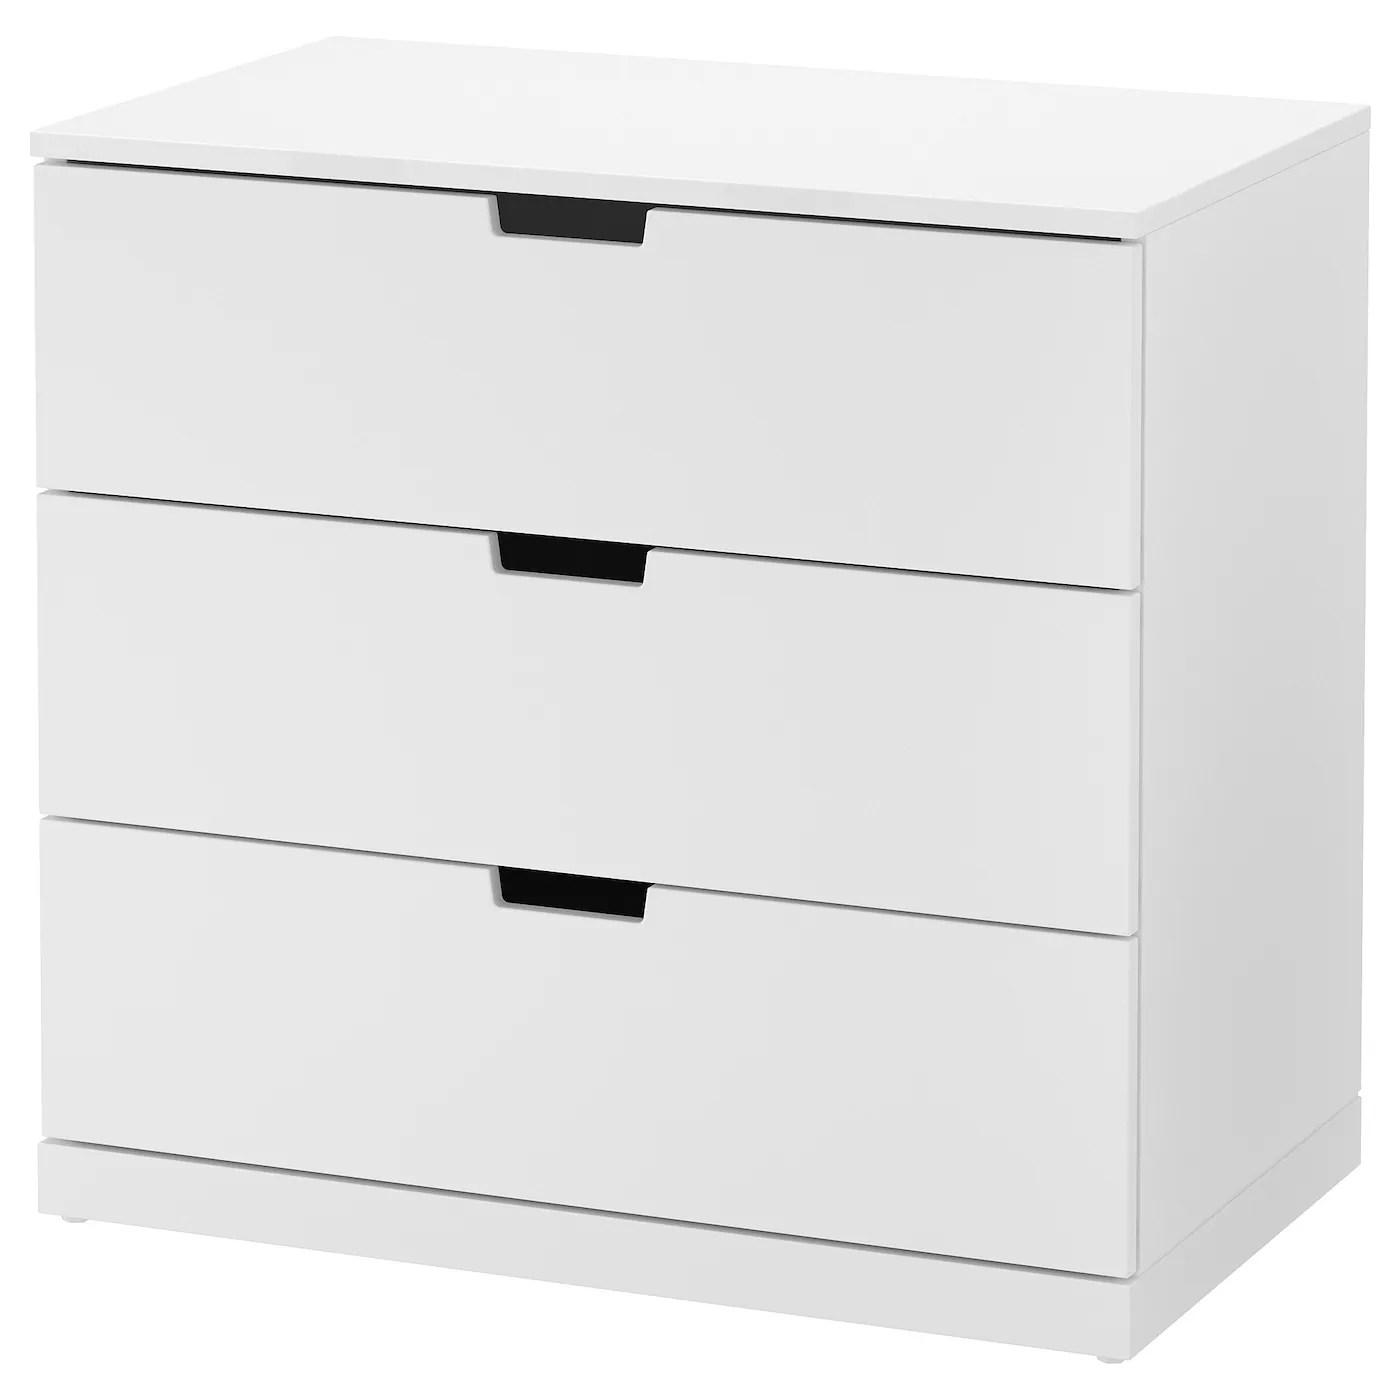 NORDLI Commode 3 Tiroirs Blanc 80 X 76 Cm IKEA